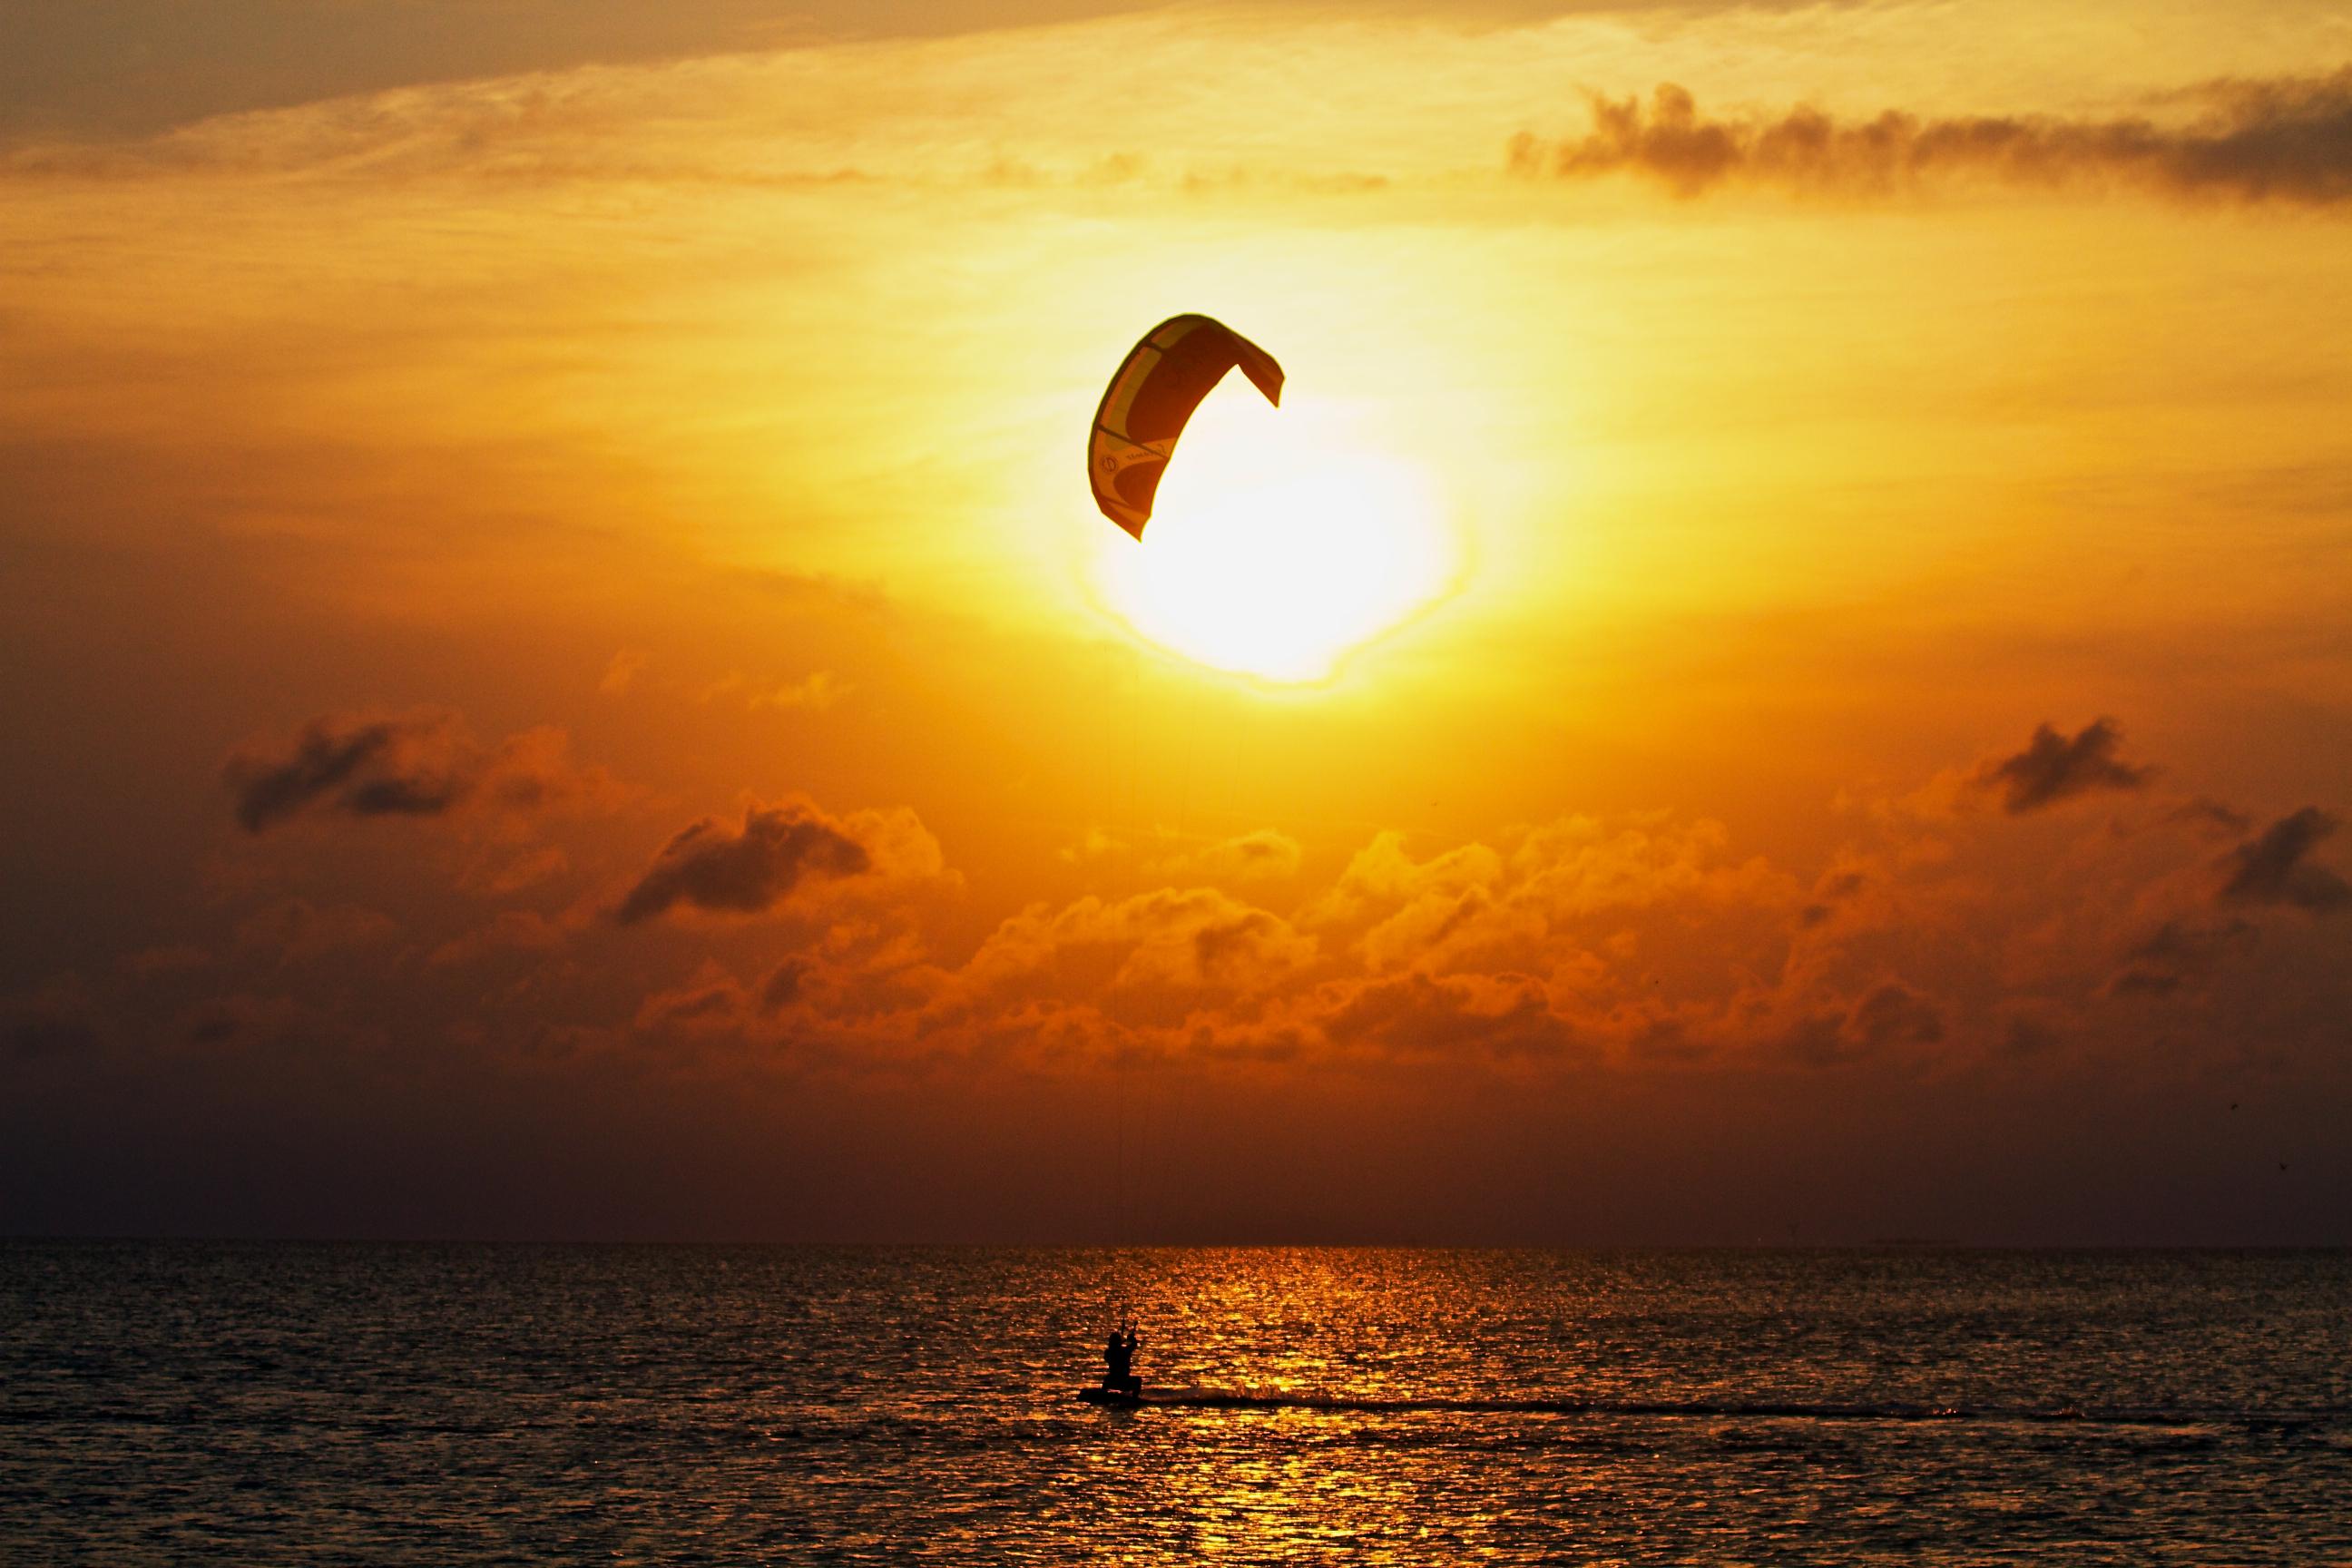 kitesurfing, sky surfing, sunset, beach, sea, ocean, water, sport, extreme, sailing, sun